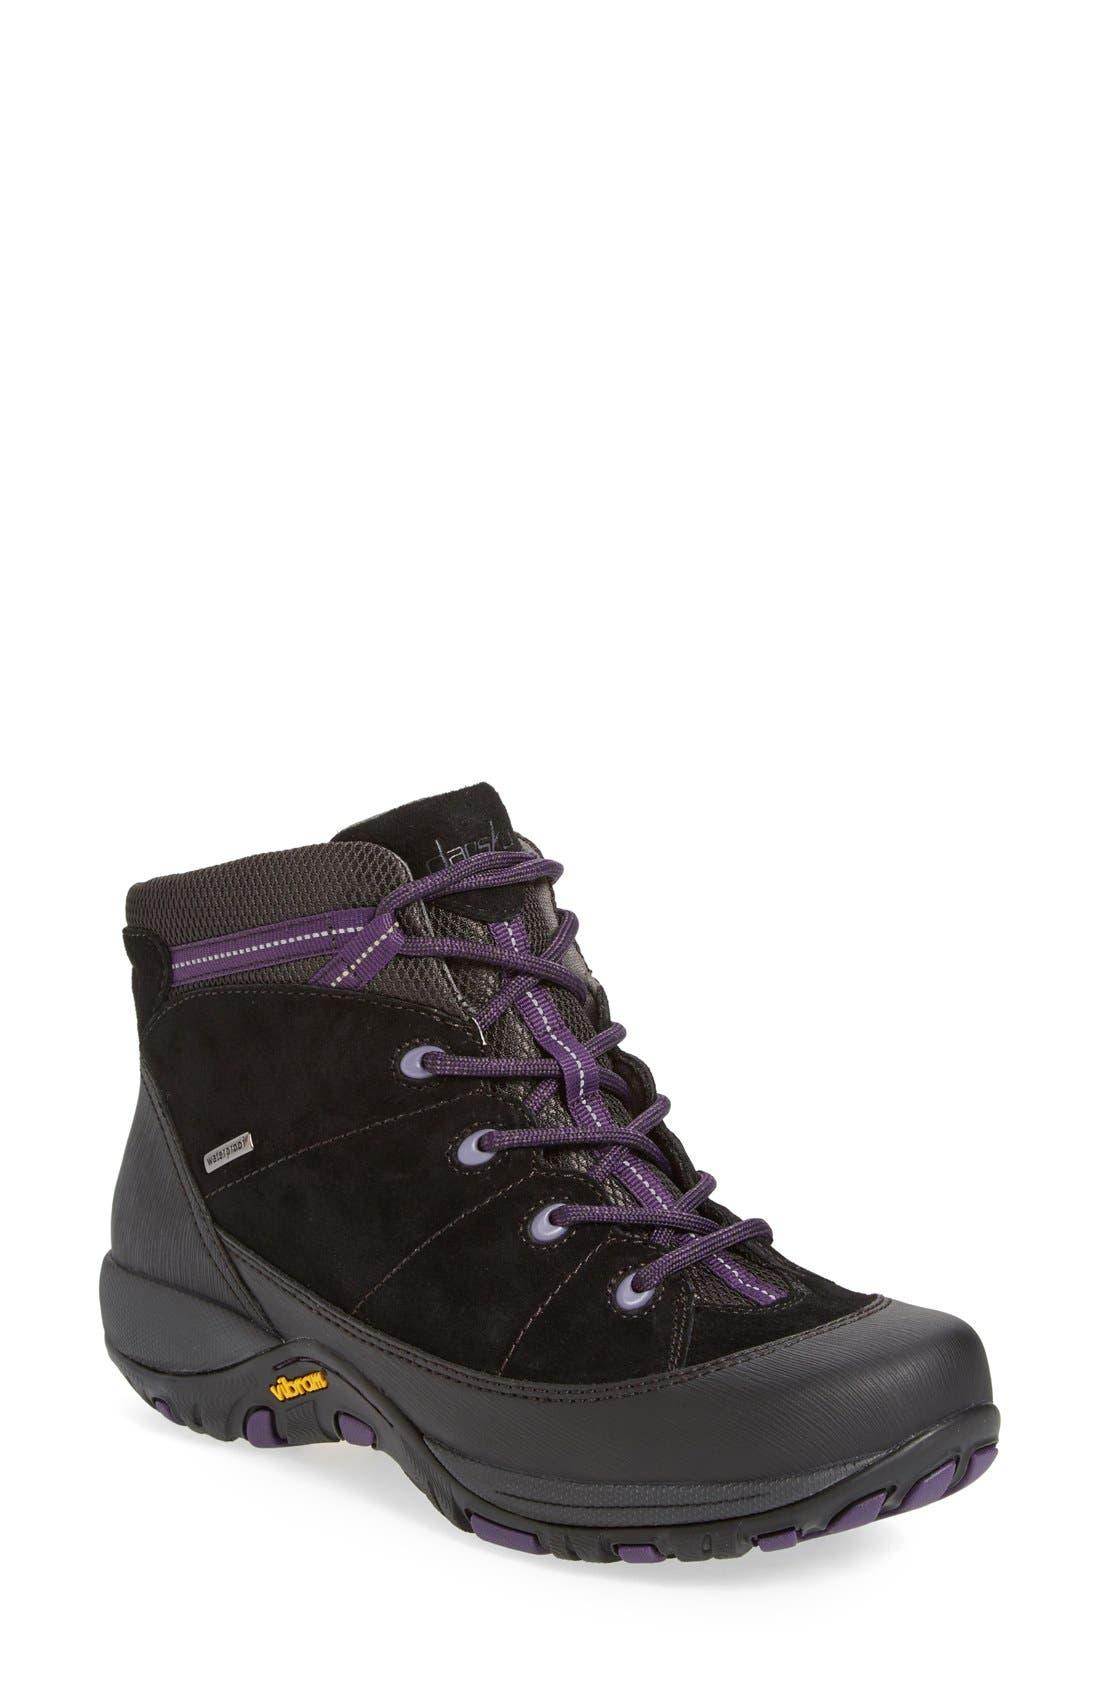 'Paulette' Waterproof Hiking Boot,                         Main,                         color, 001